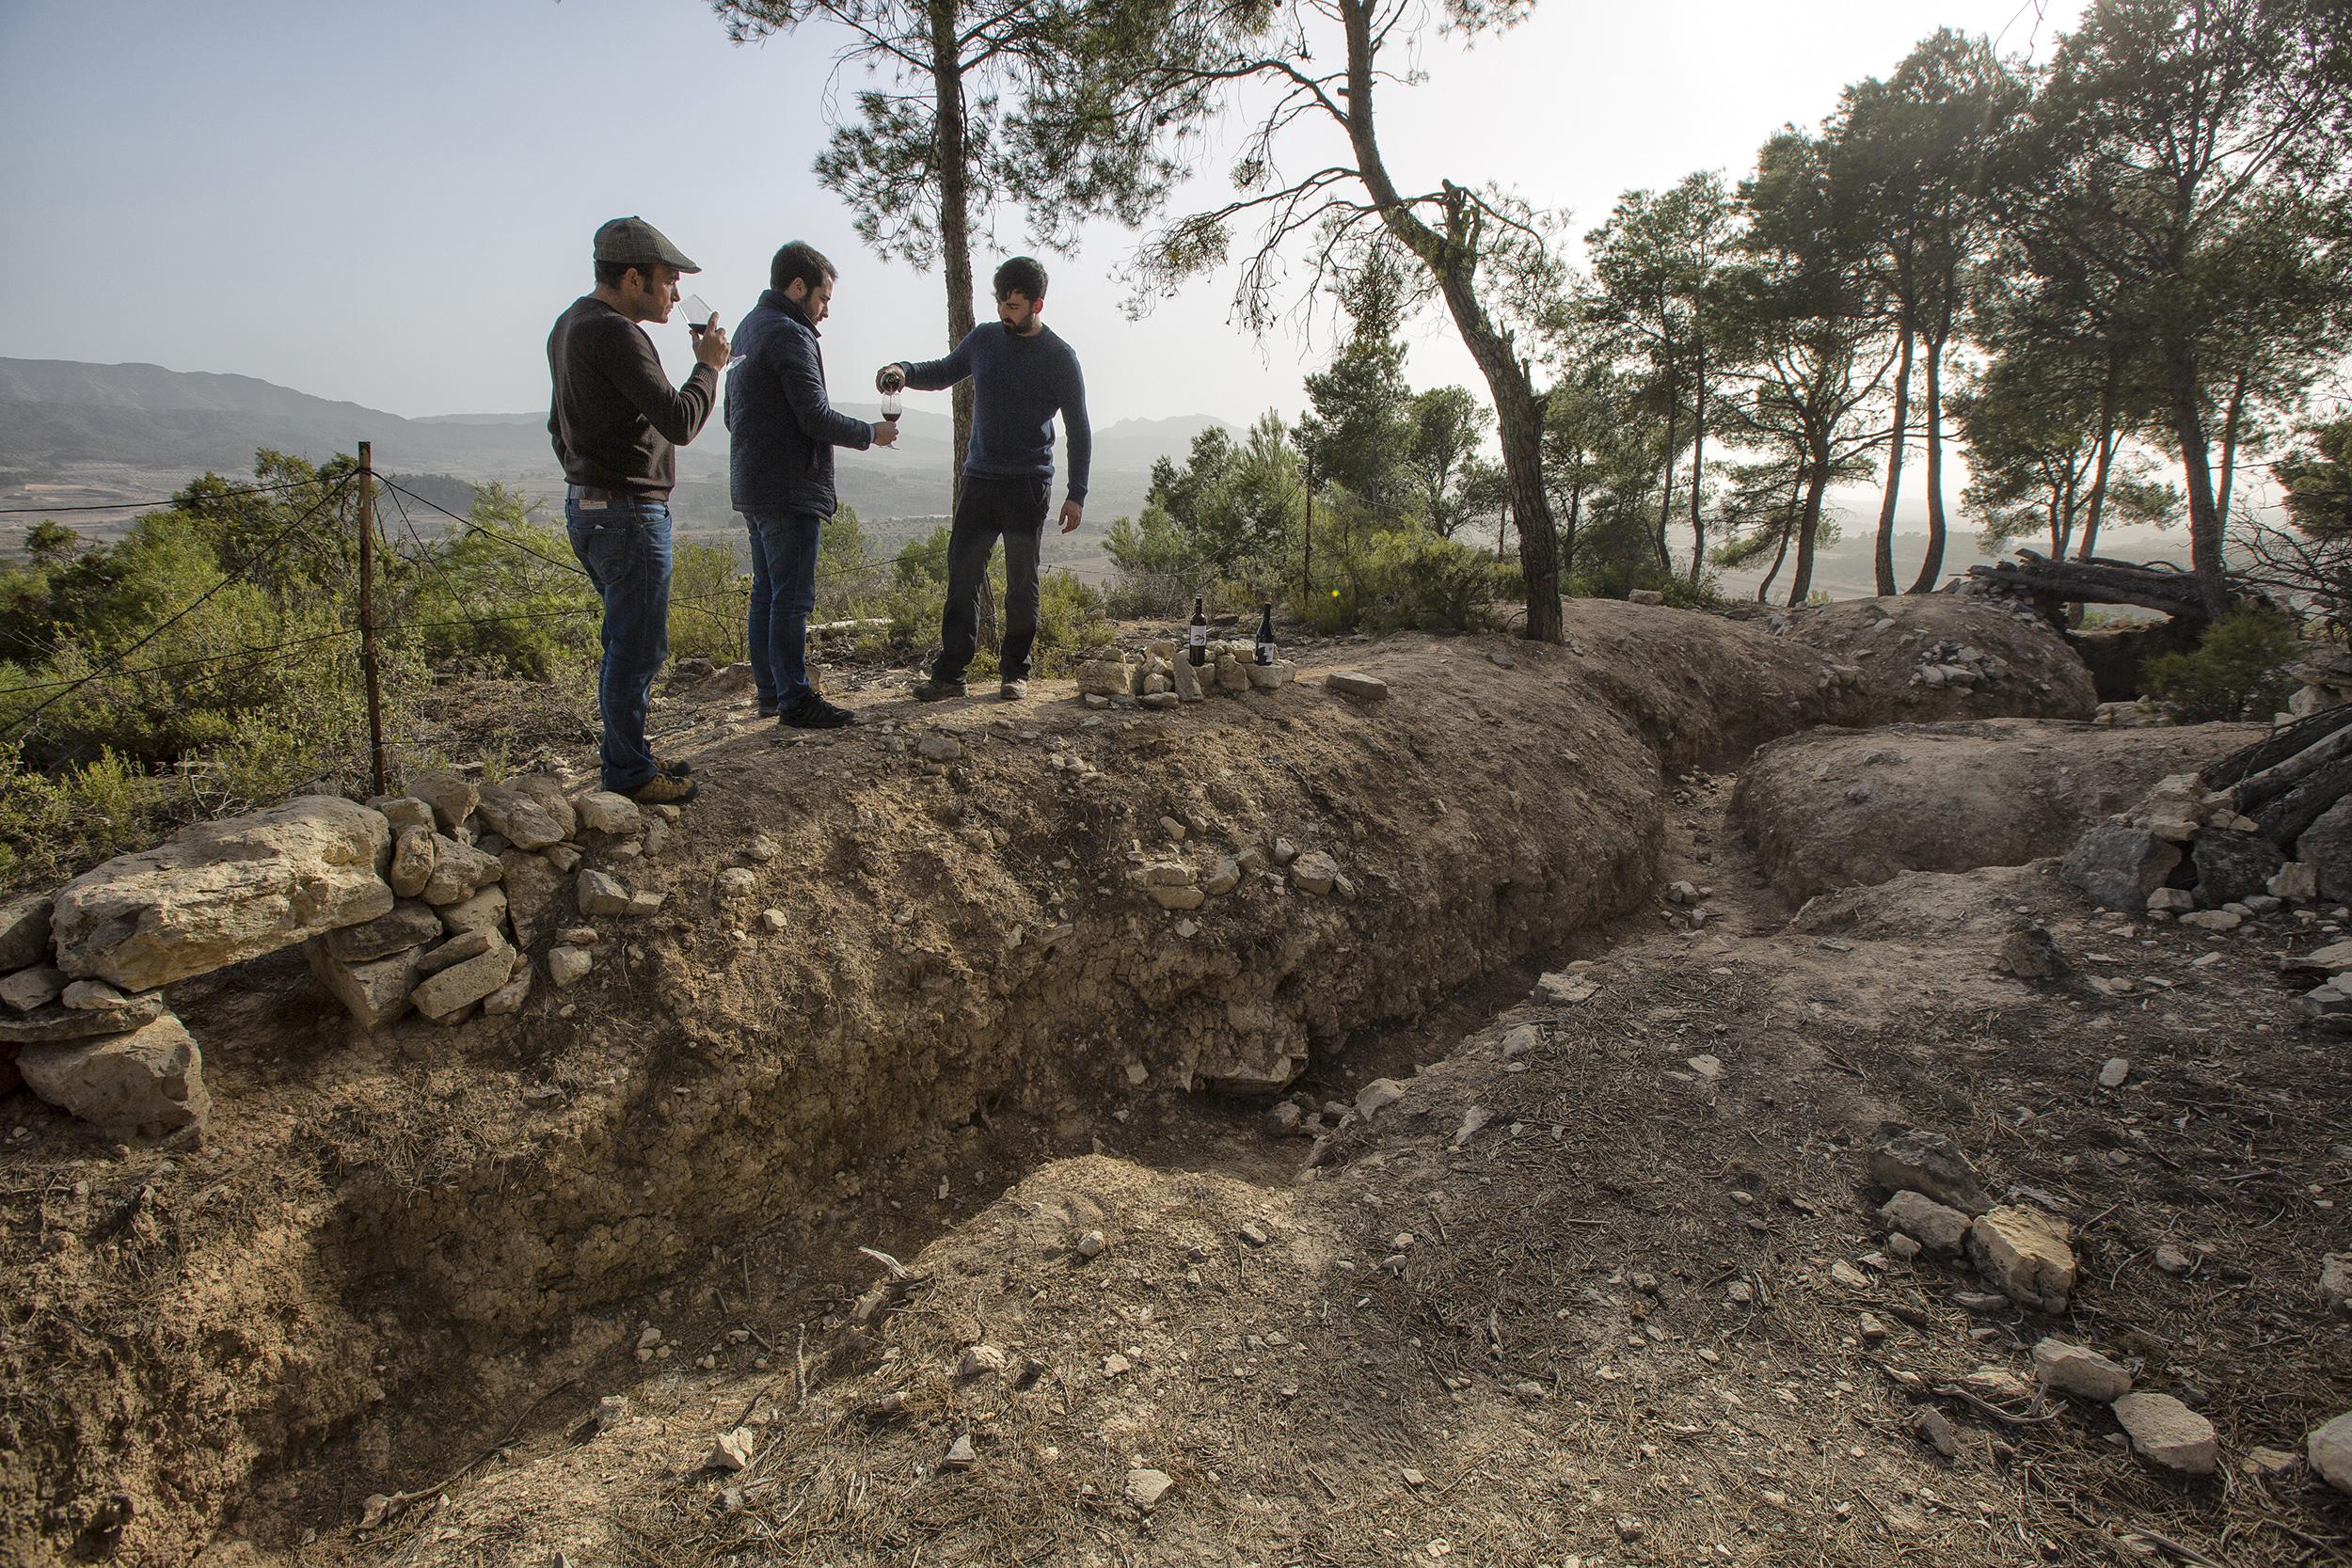 Cave Frisach © Patronat de Turisme de les Terres de l'Ebre